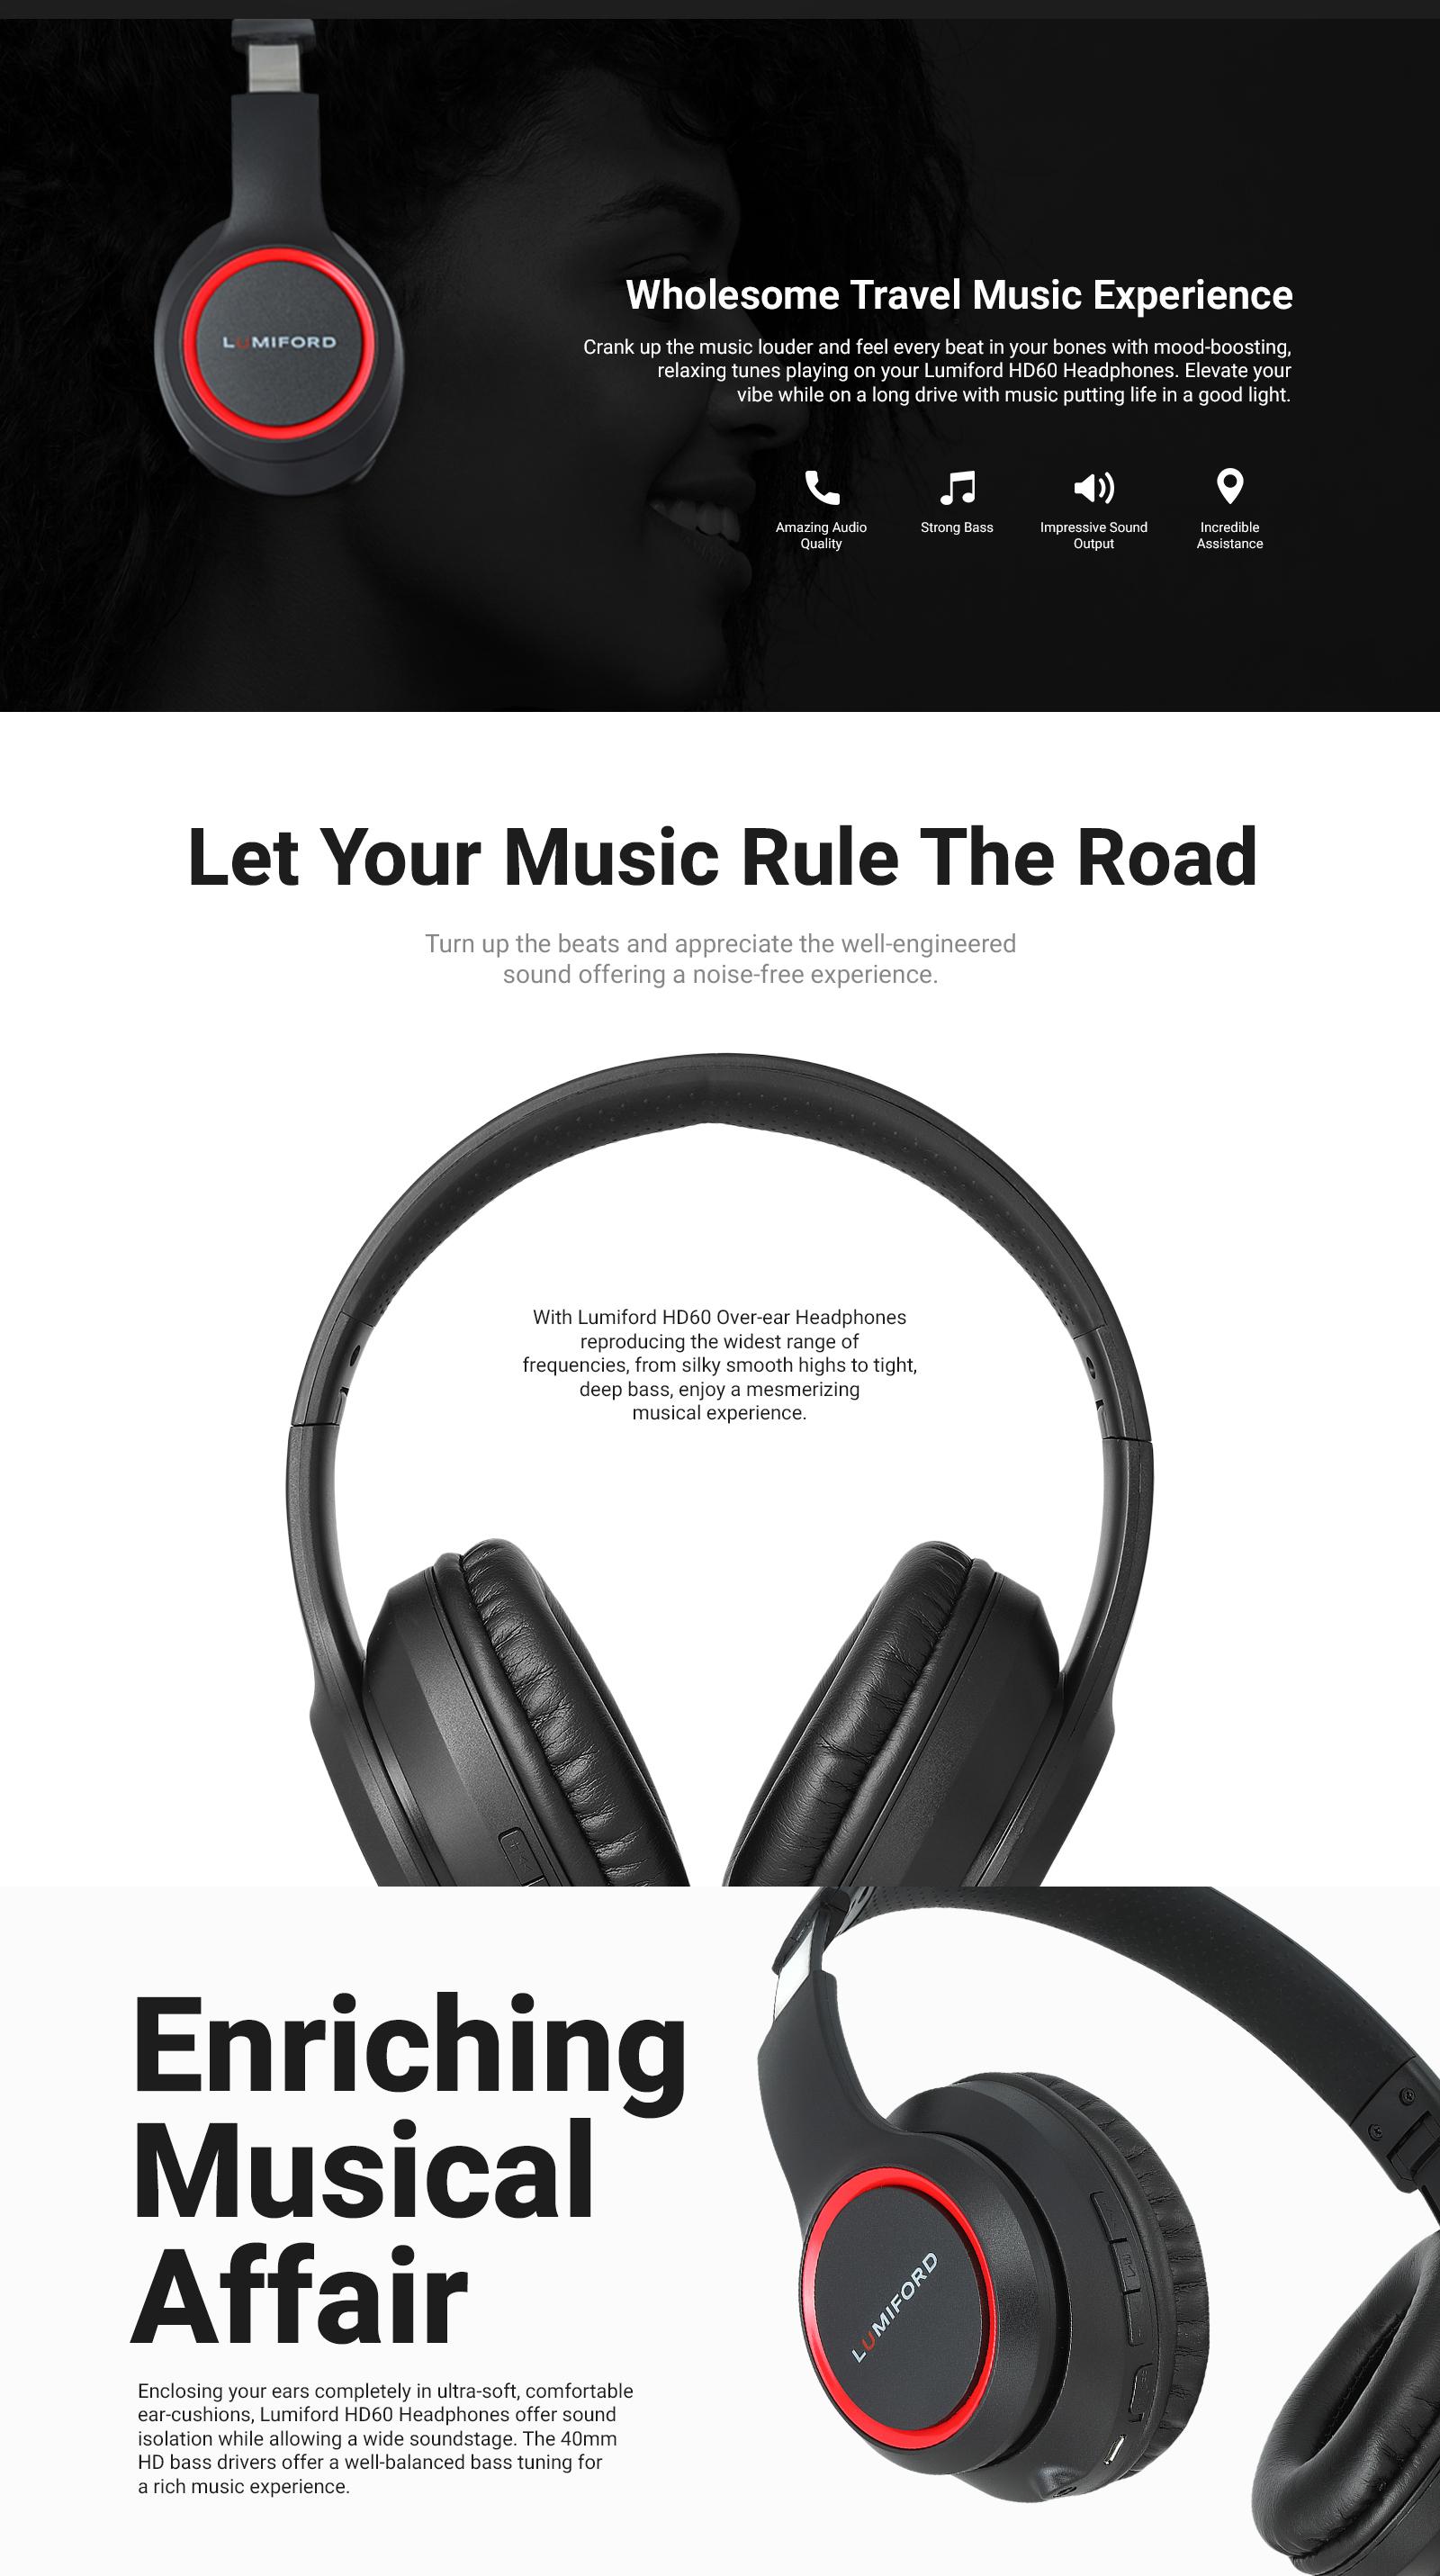 LUMIFORD HD60 Wireless Headphones